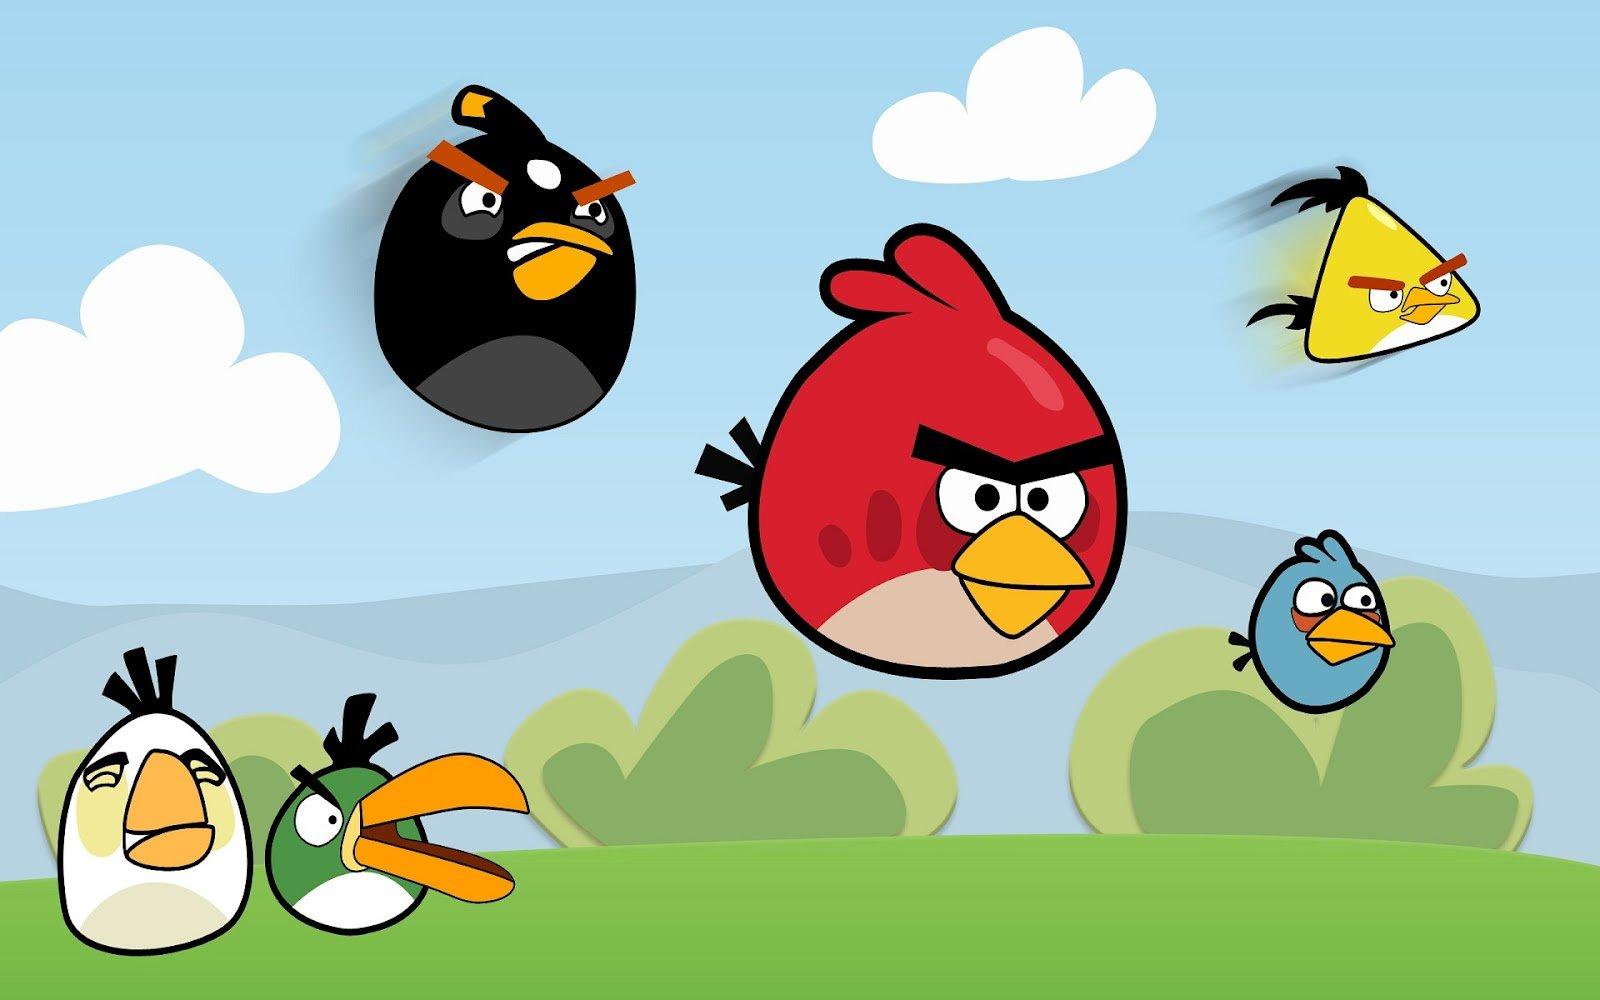 Angrybirds Francescanatale 05: Aula De Música: Jugando Con Angry Birds